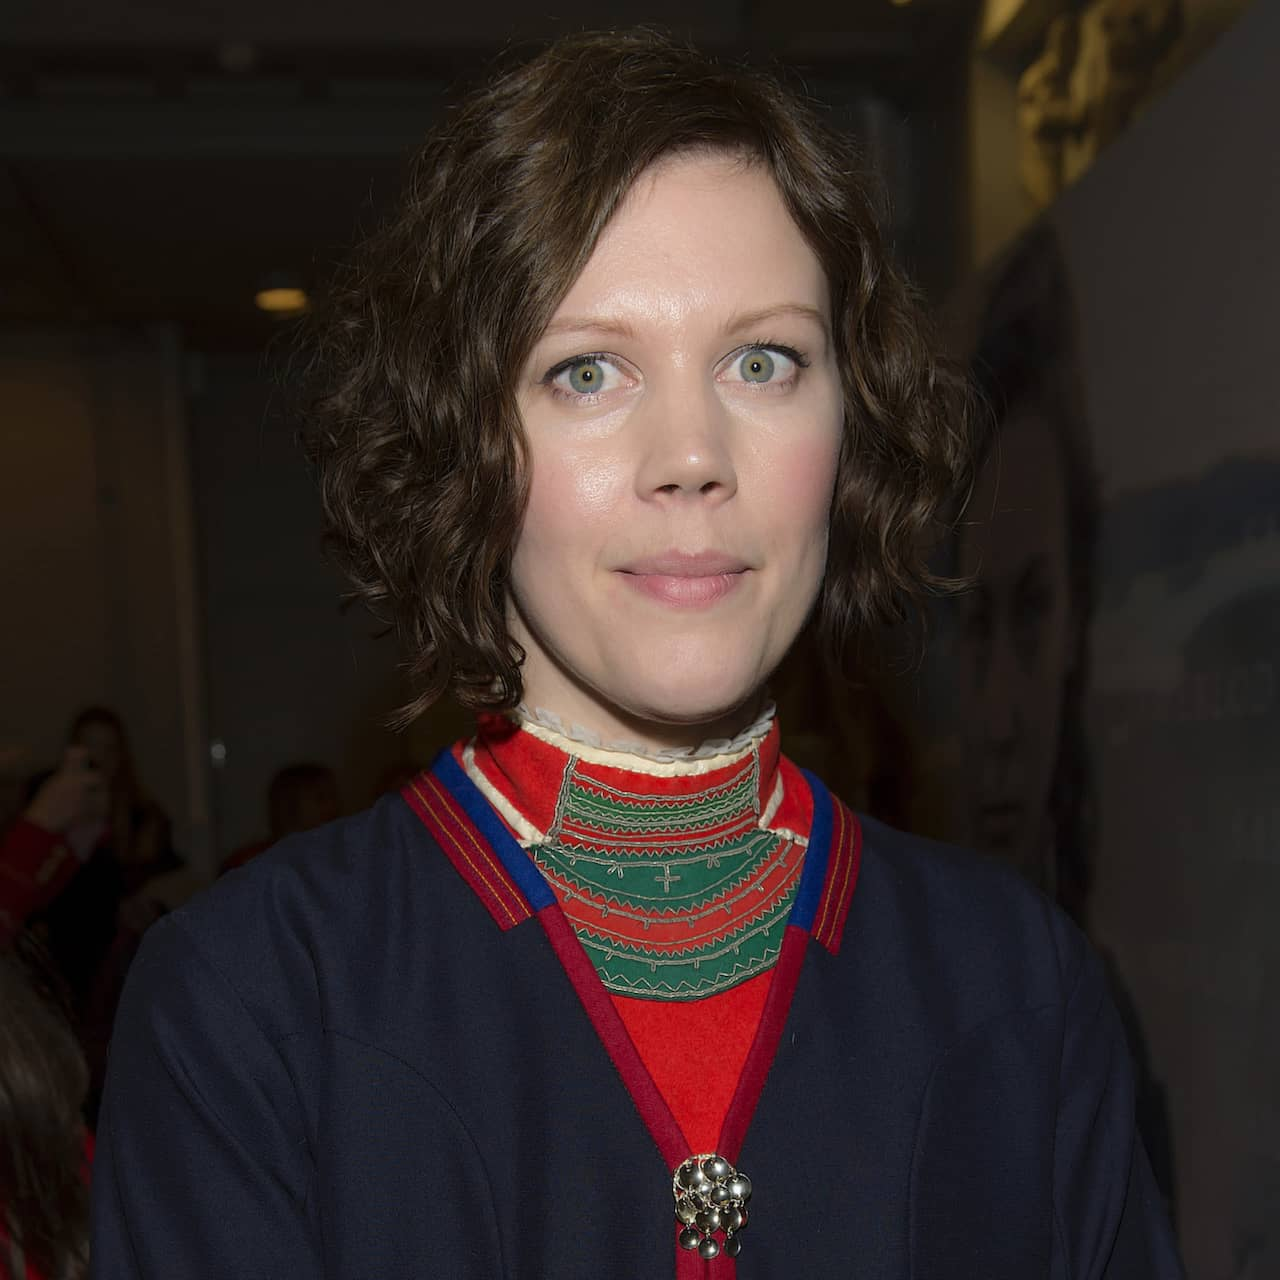 82. Amanda Kernell